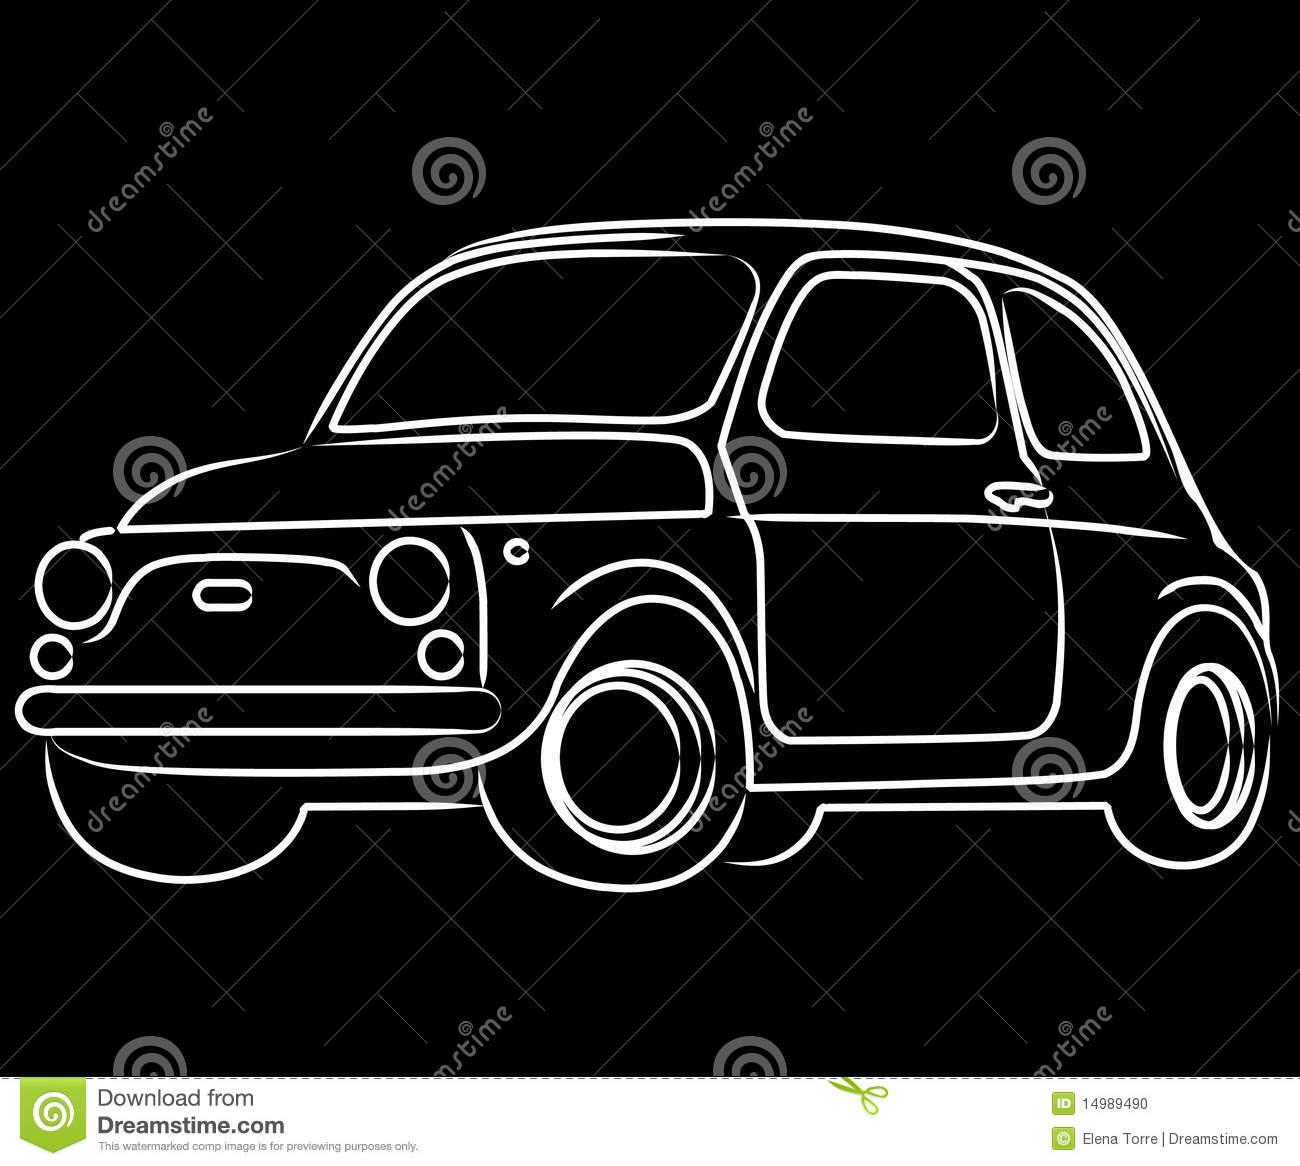 Fiat Cinquecento Car Stock Photo.